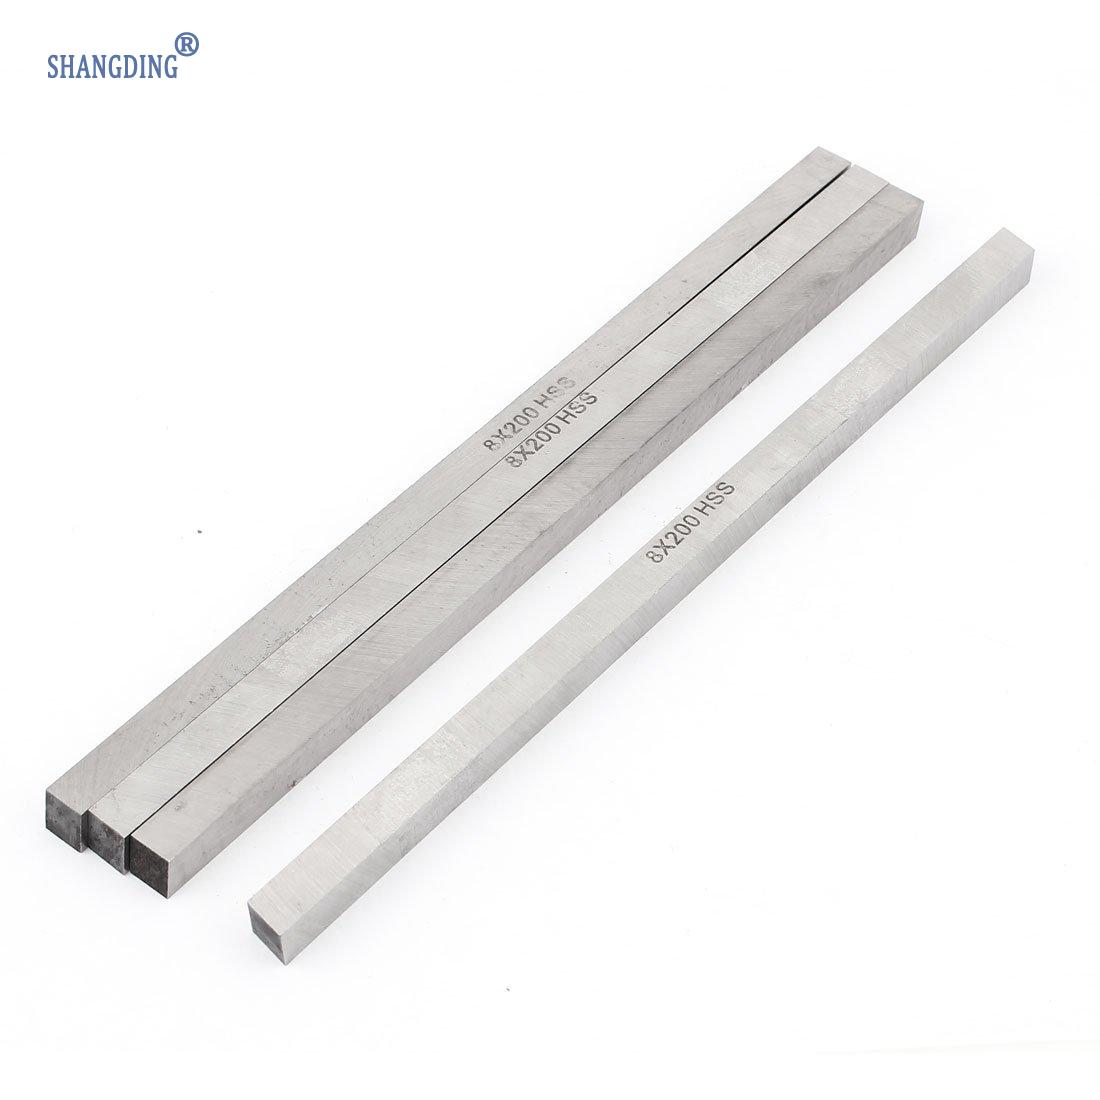 Купить с кэшбэком Promotion! 4 pcs CNC Lathe HSS Square Cutting Tool Bits Bar 8mm x 8mm x 200mm Gray